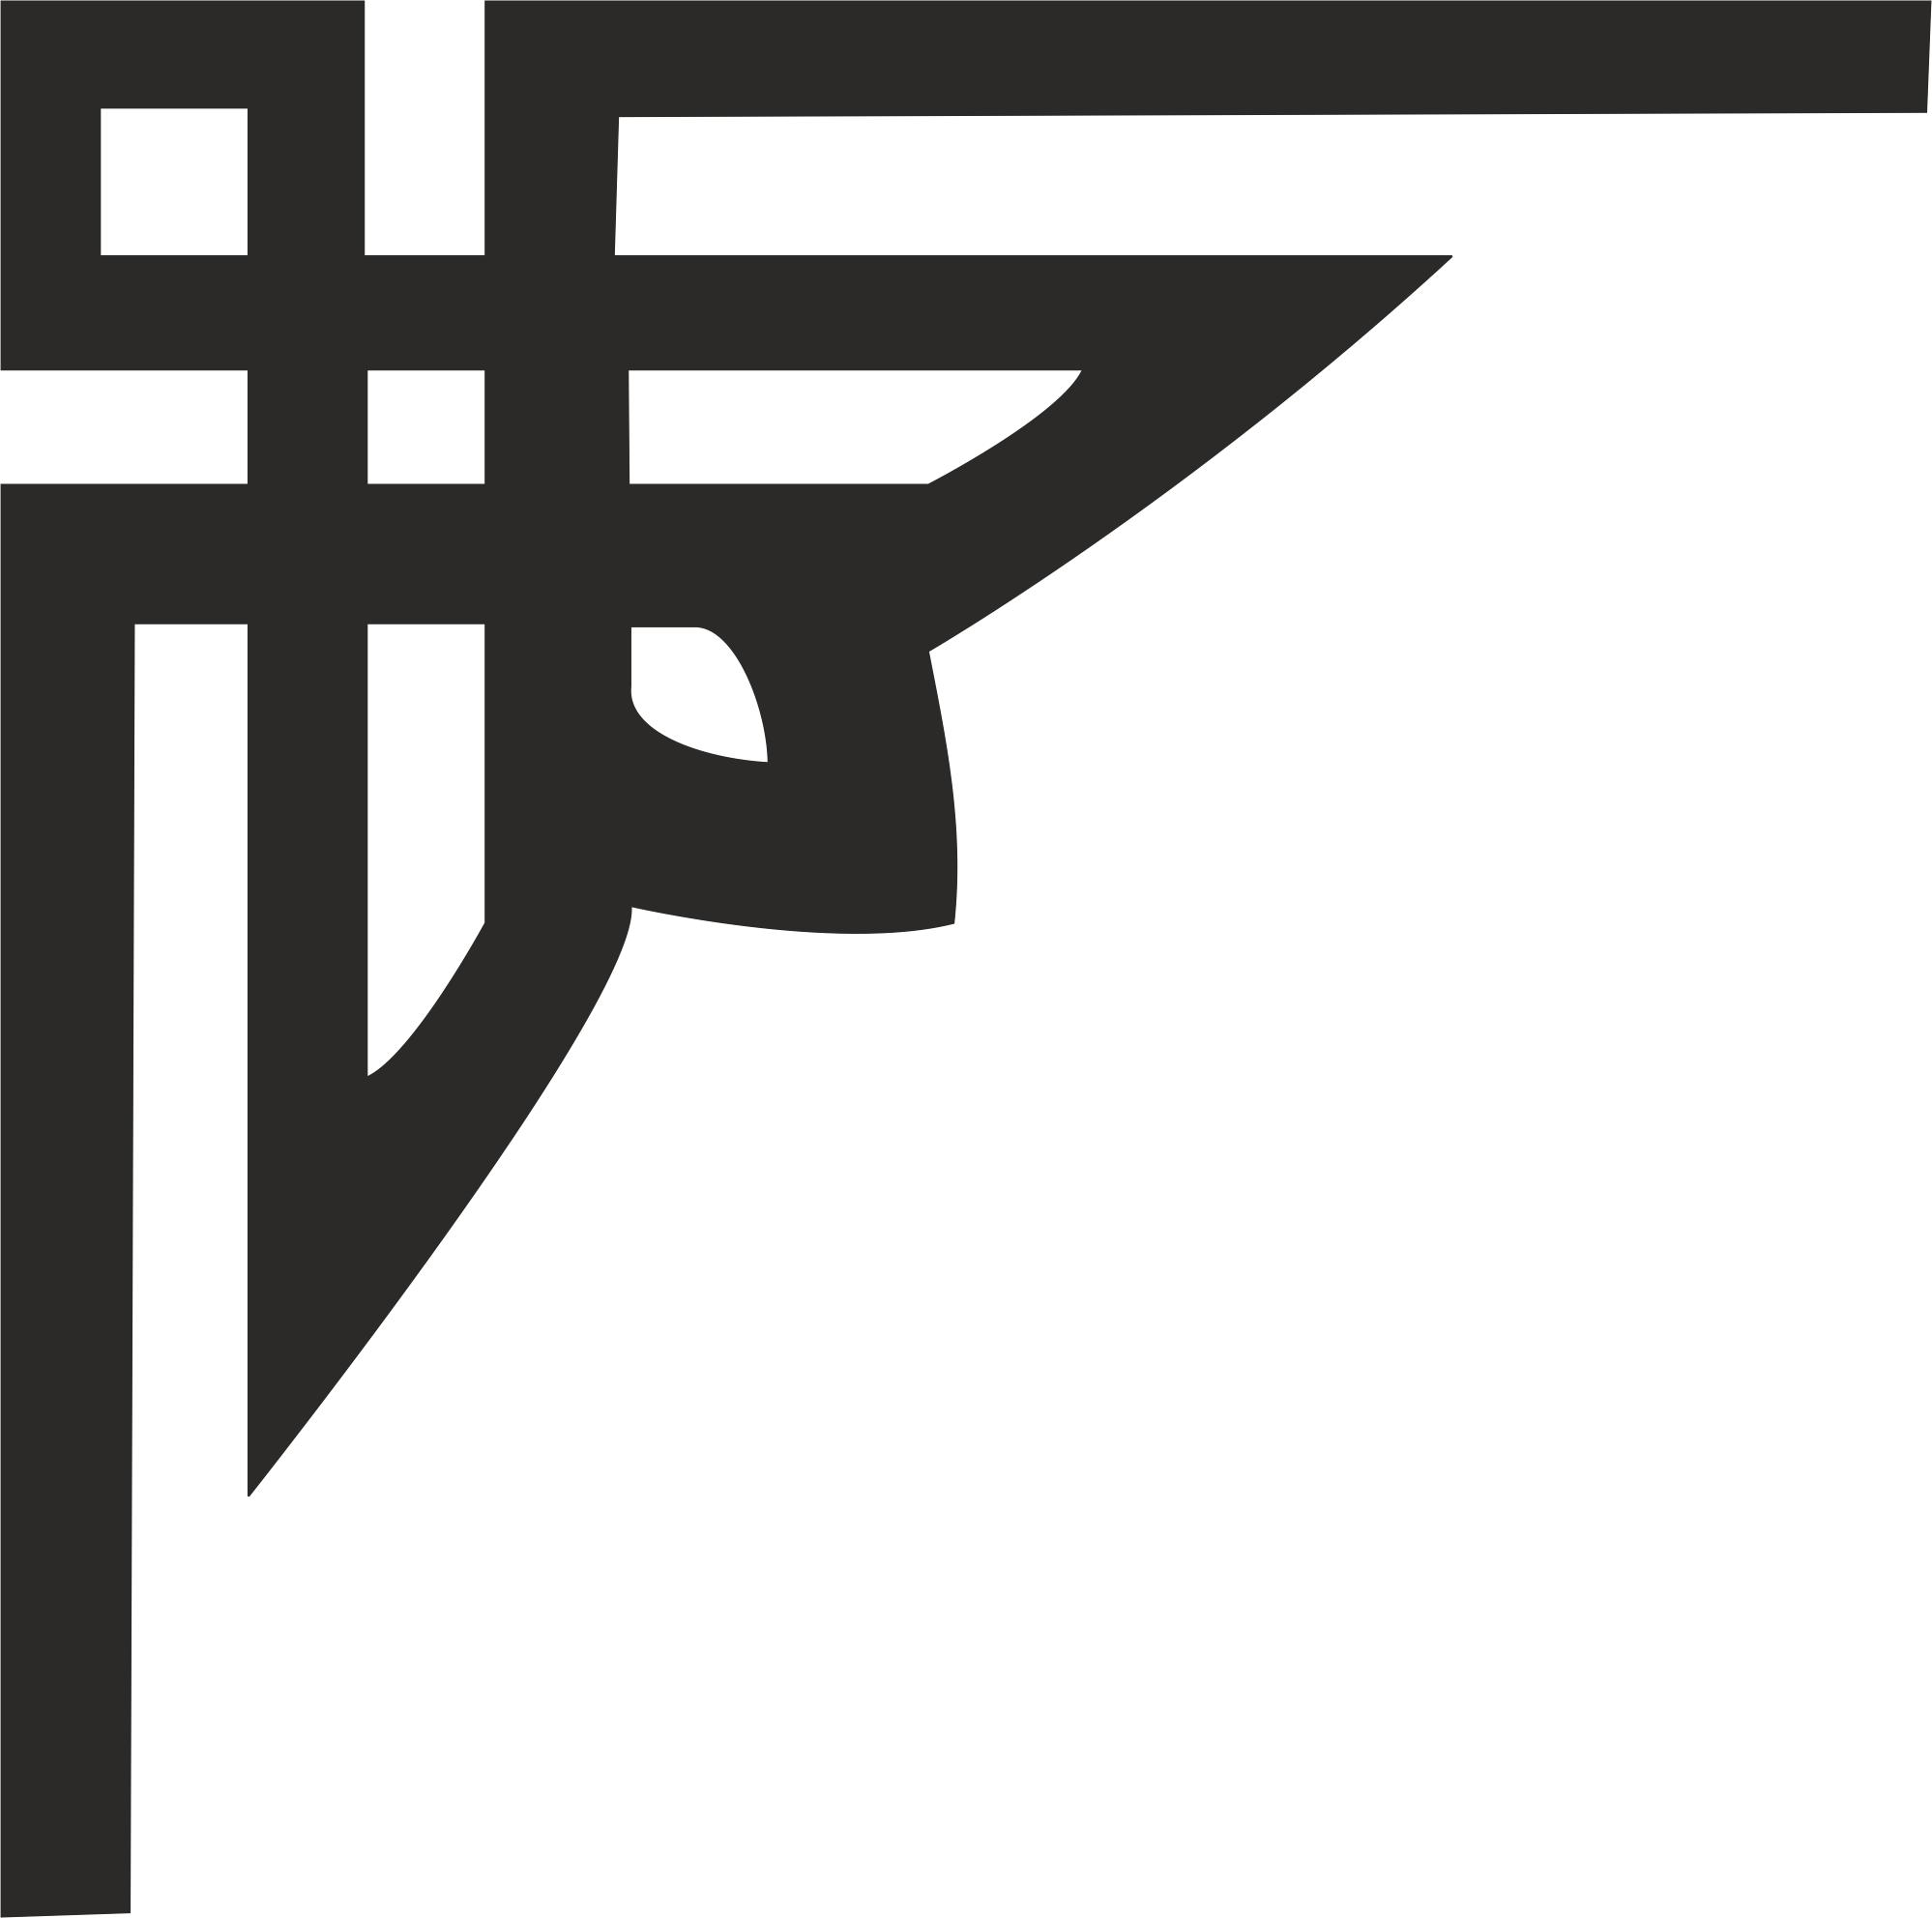 Classical simple border decorative dxf File